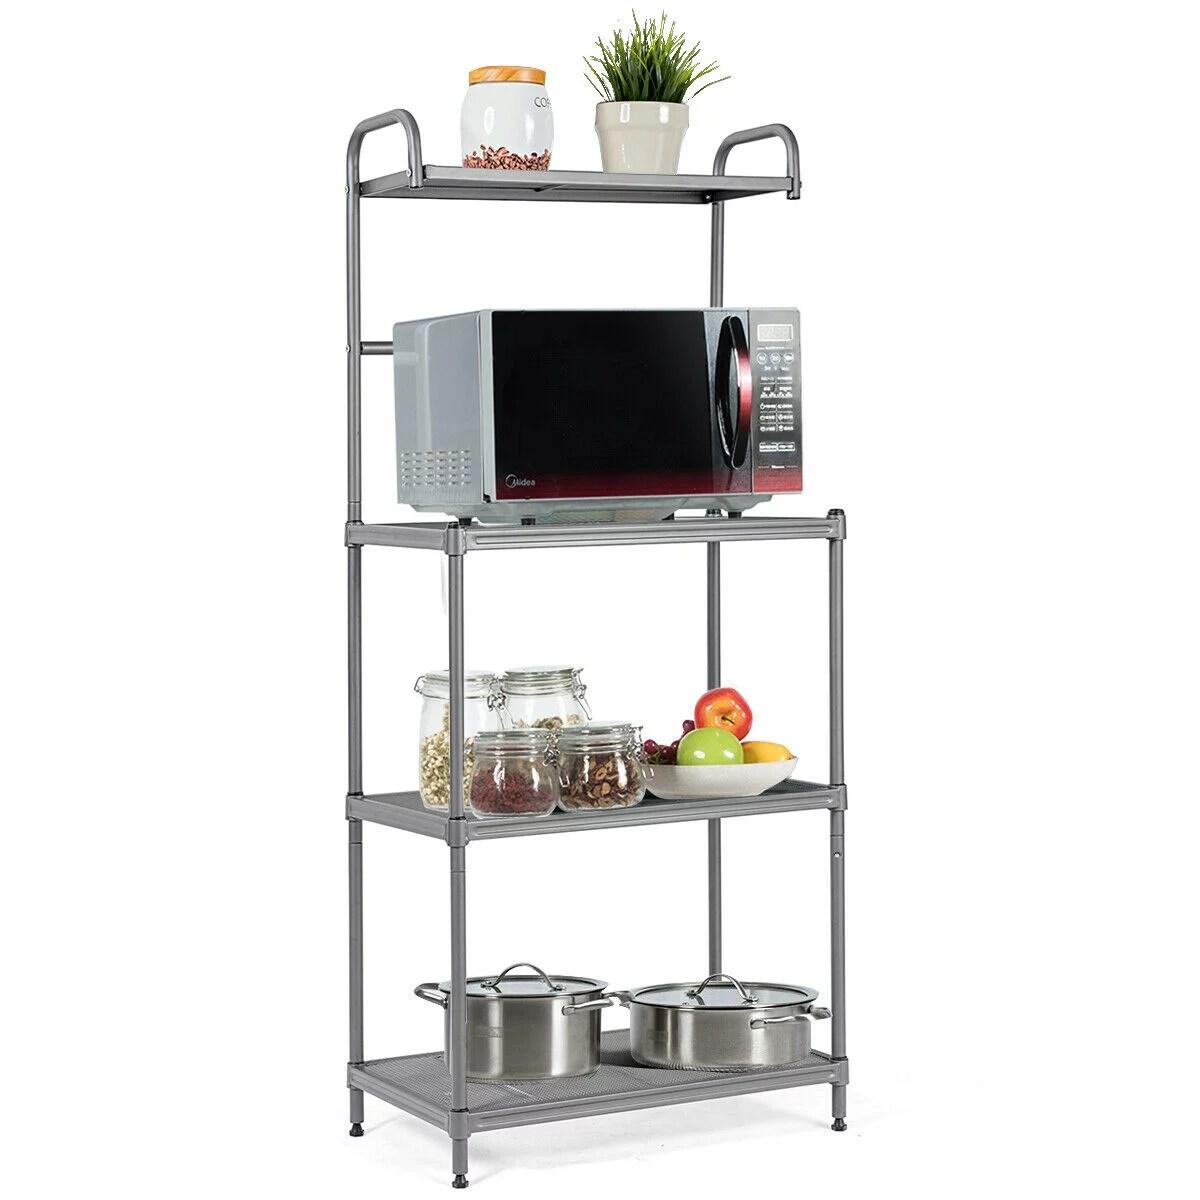 costway 4 tier baker s rack microwave oven stand shelves kitchen storage rack organizer walmart com